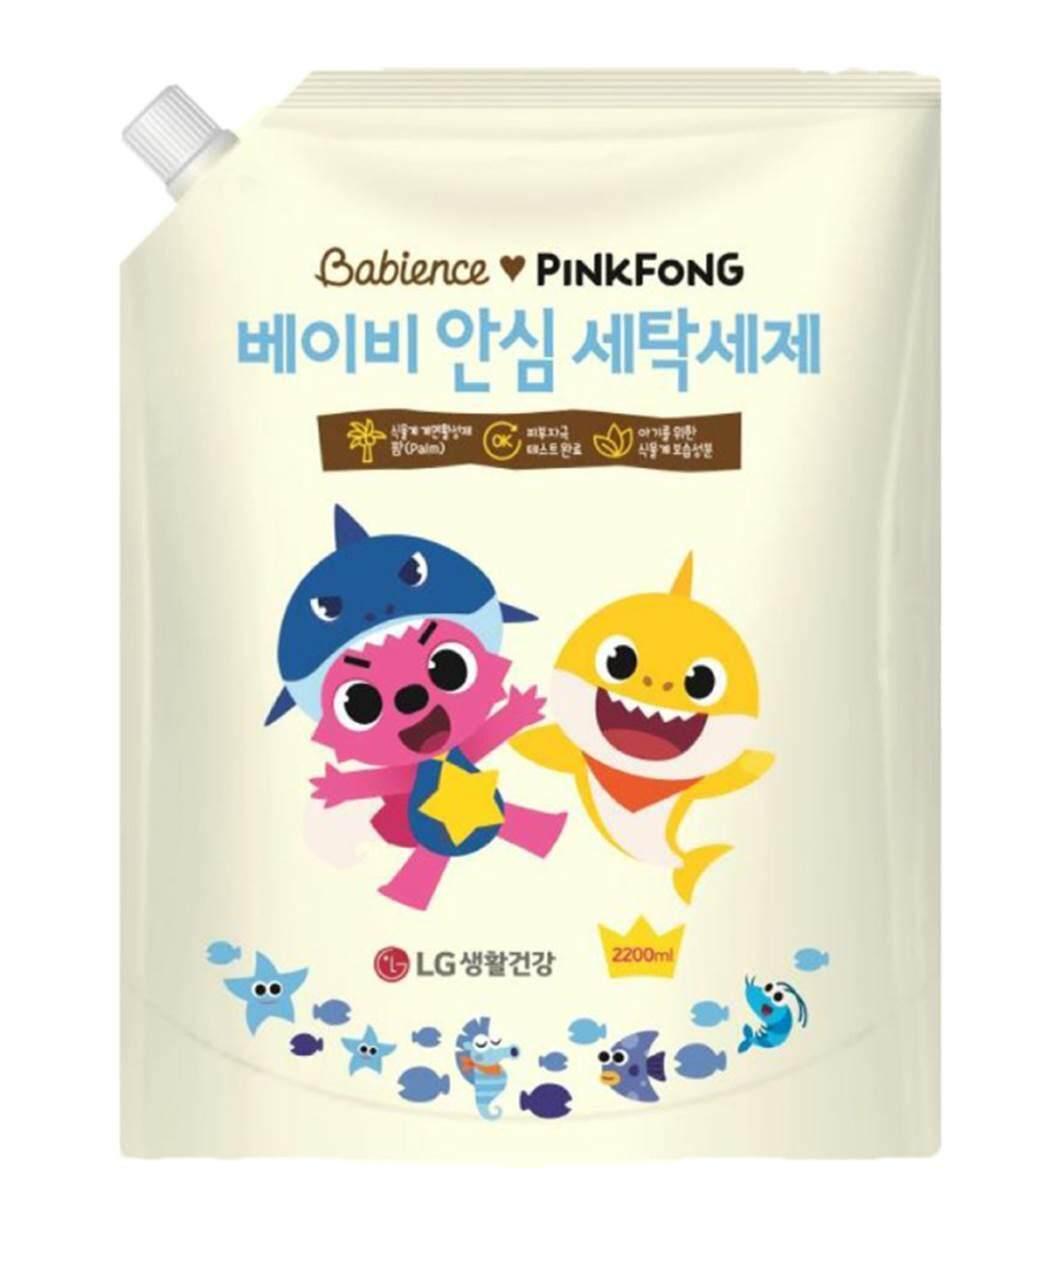 LG Babience Detergent Refill Pack 2200ml